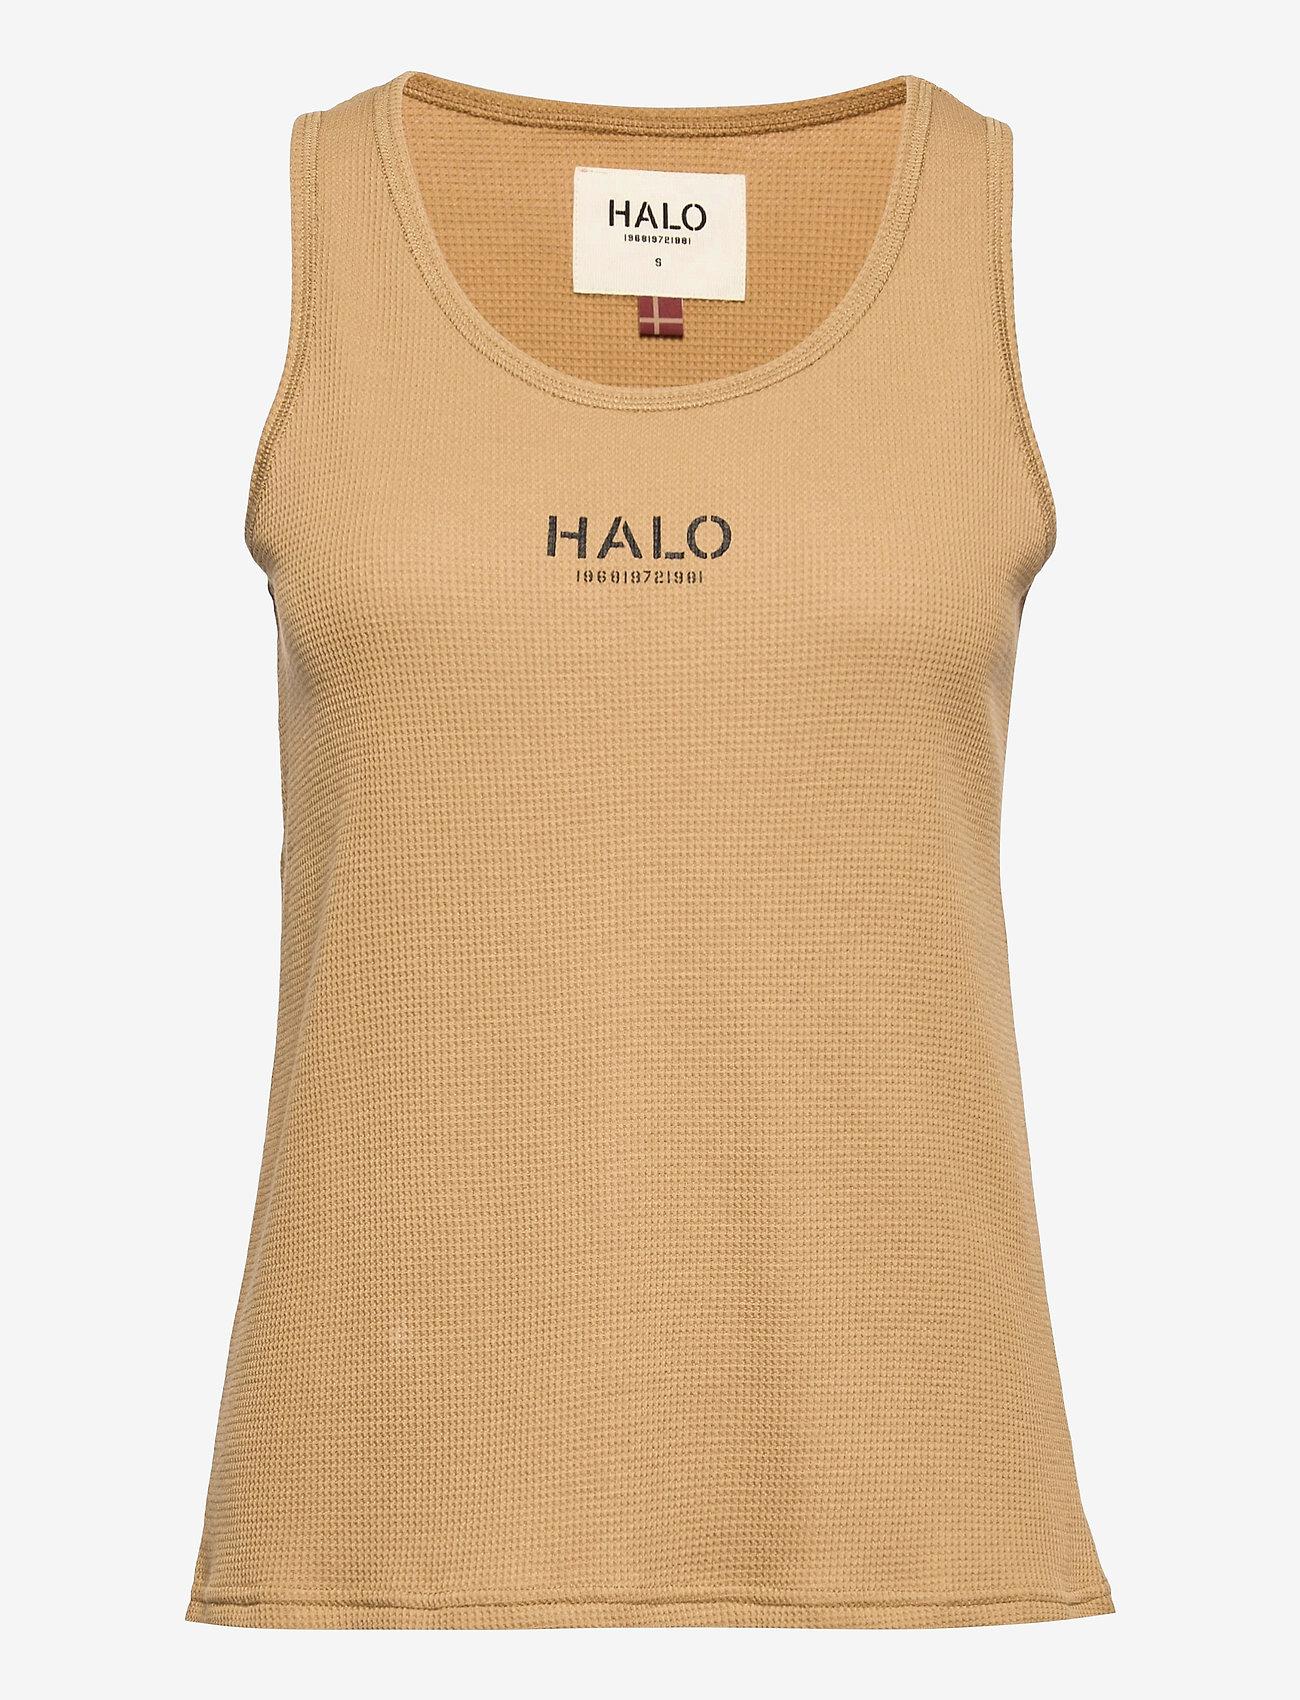 HALO - HALO WOMENS WAFFLE TANK - Ärmellose tops - kelp - 1